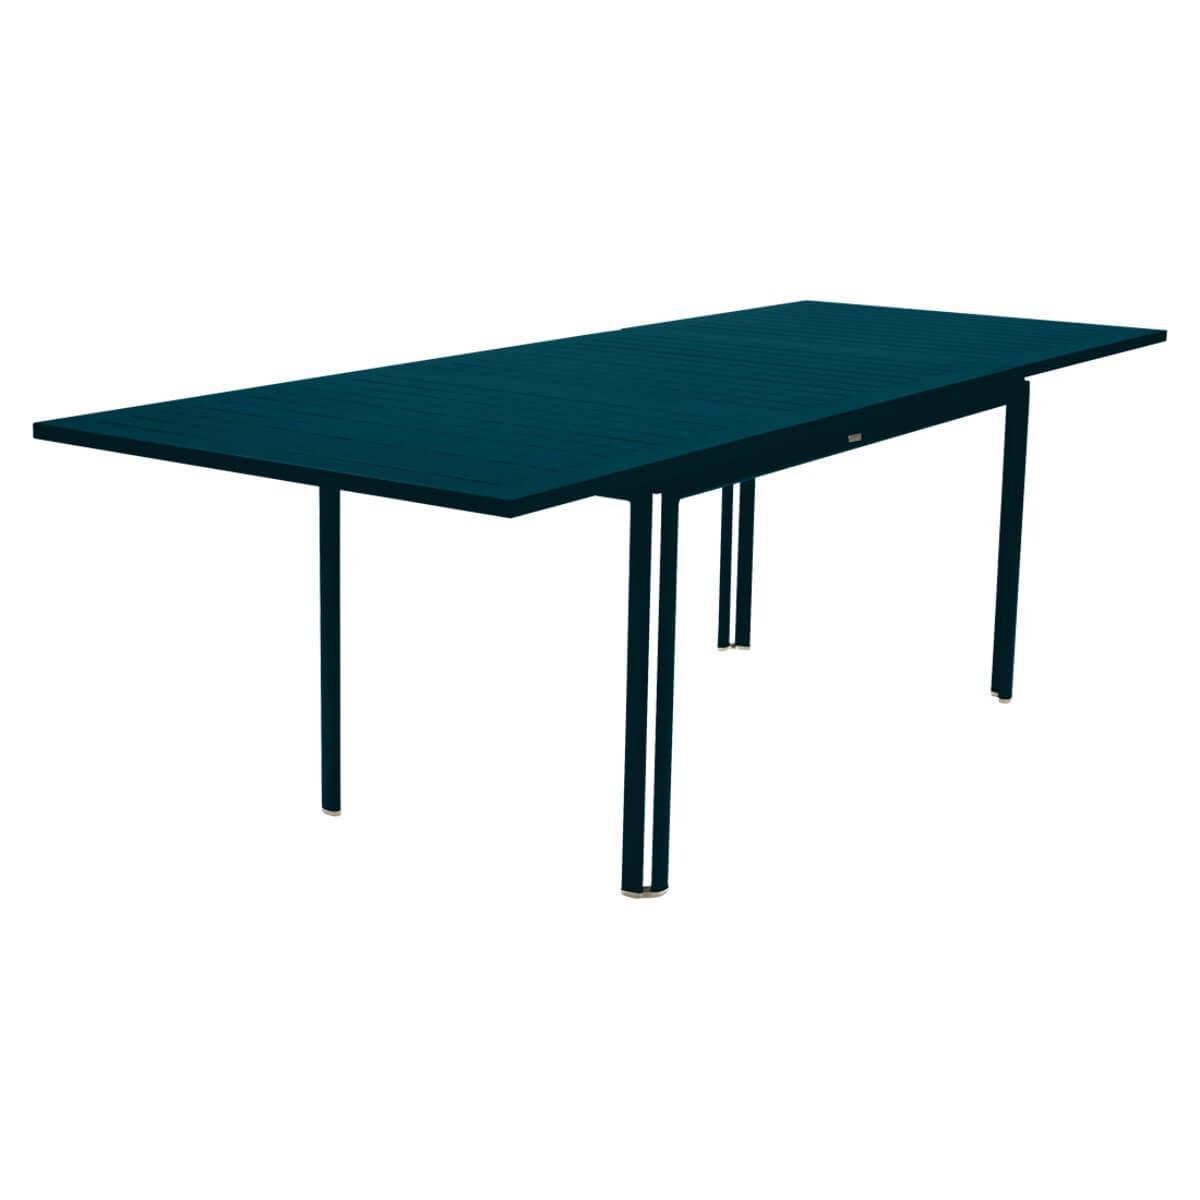 Table à rallonge 90x160/240cm COSTA Fermob bleu acapulco